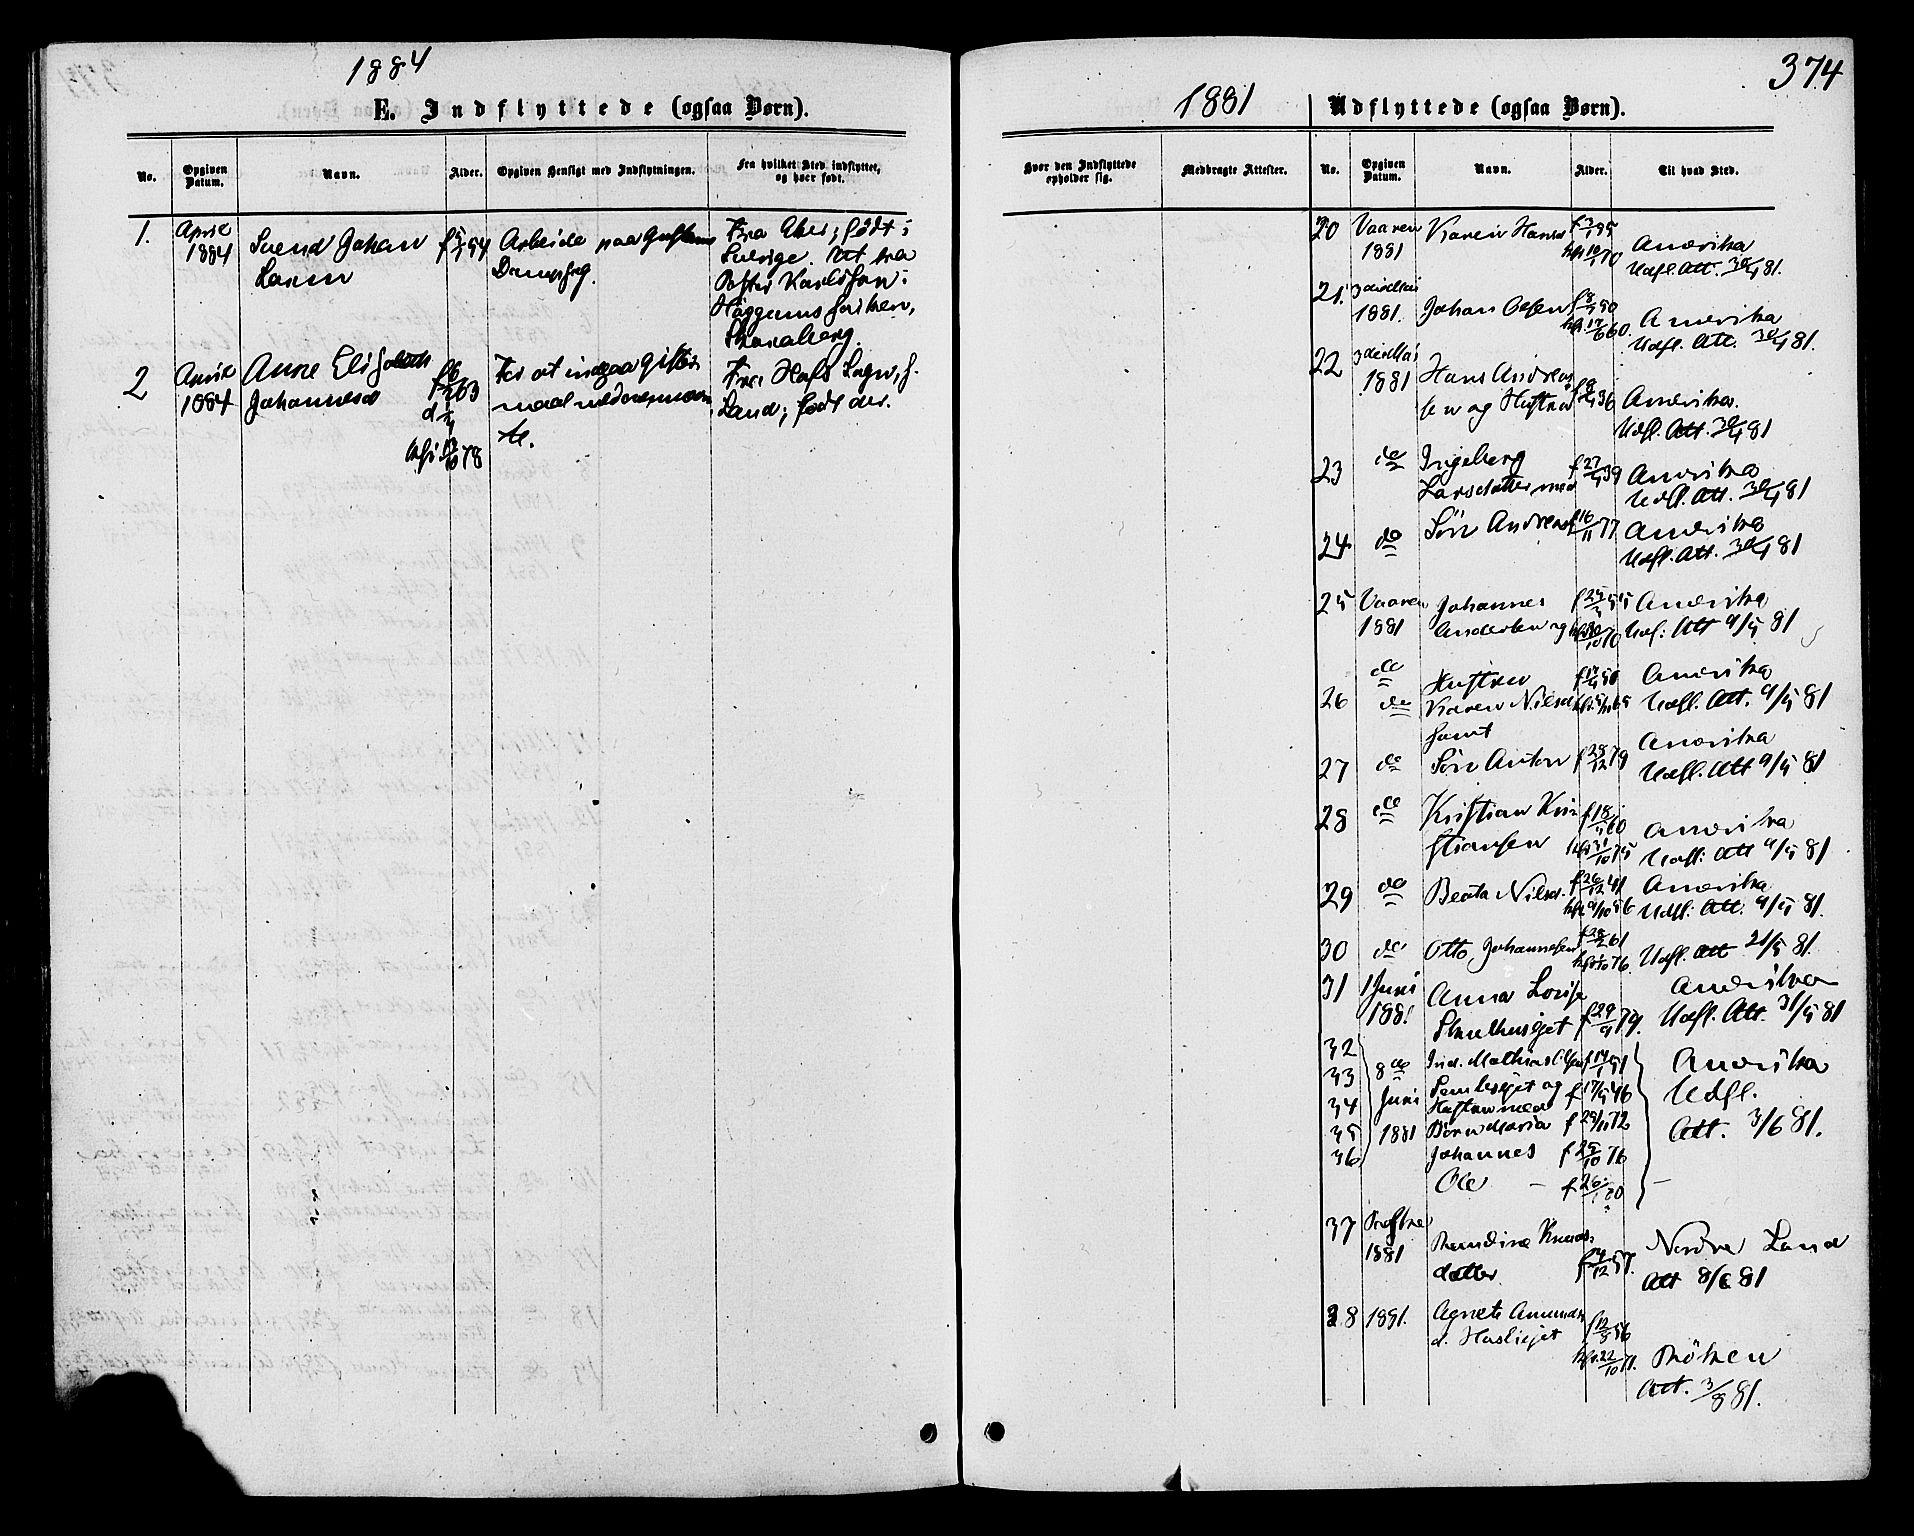 SAH, Biri prestekontor, Ministerialbok nr. 6, 1877-1886, s. 374